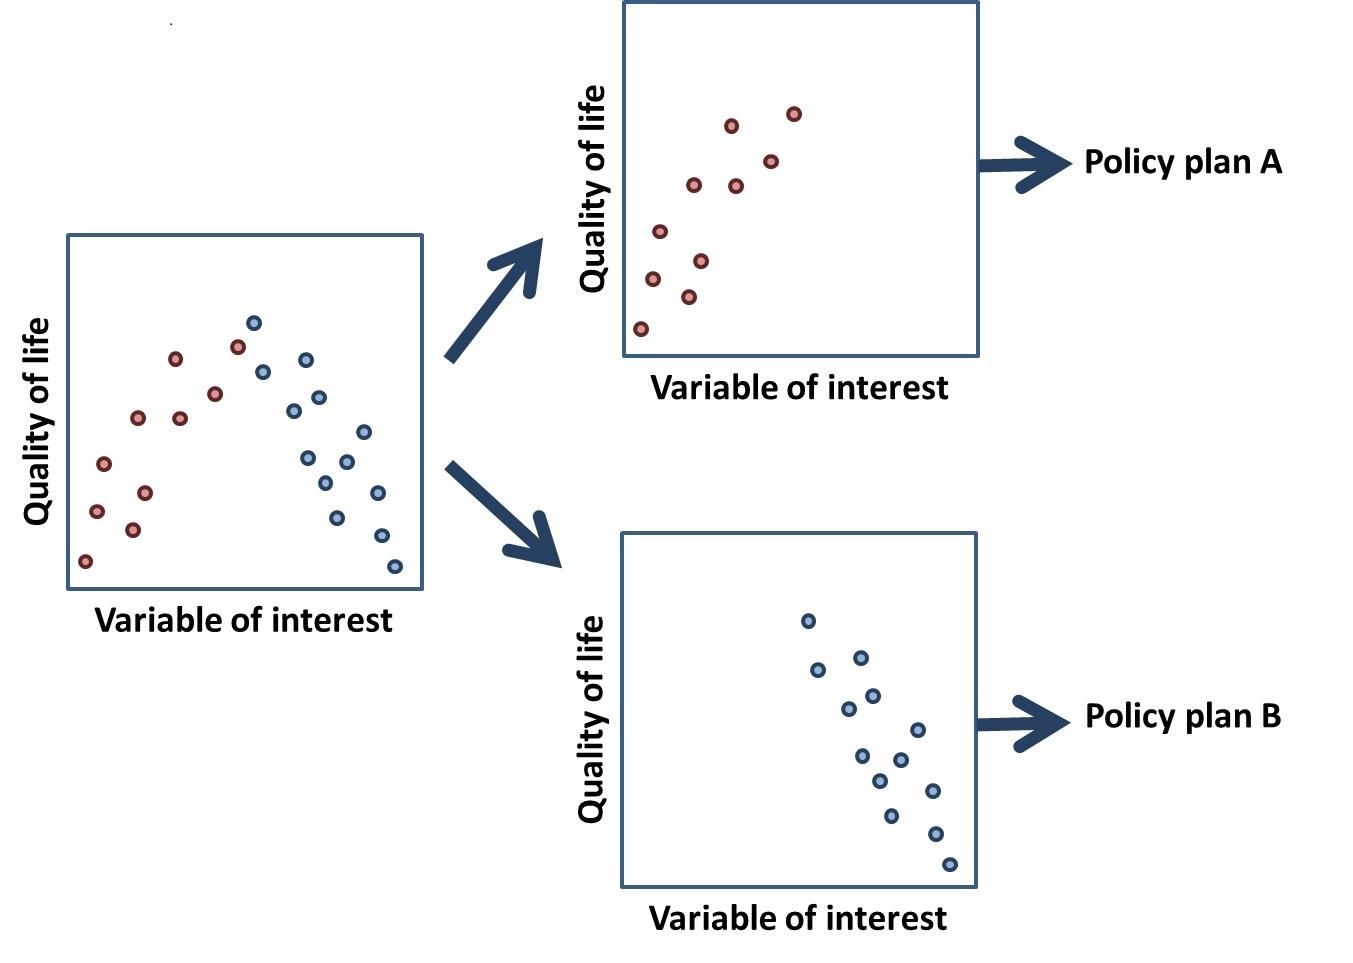 POL_Policy blog figure